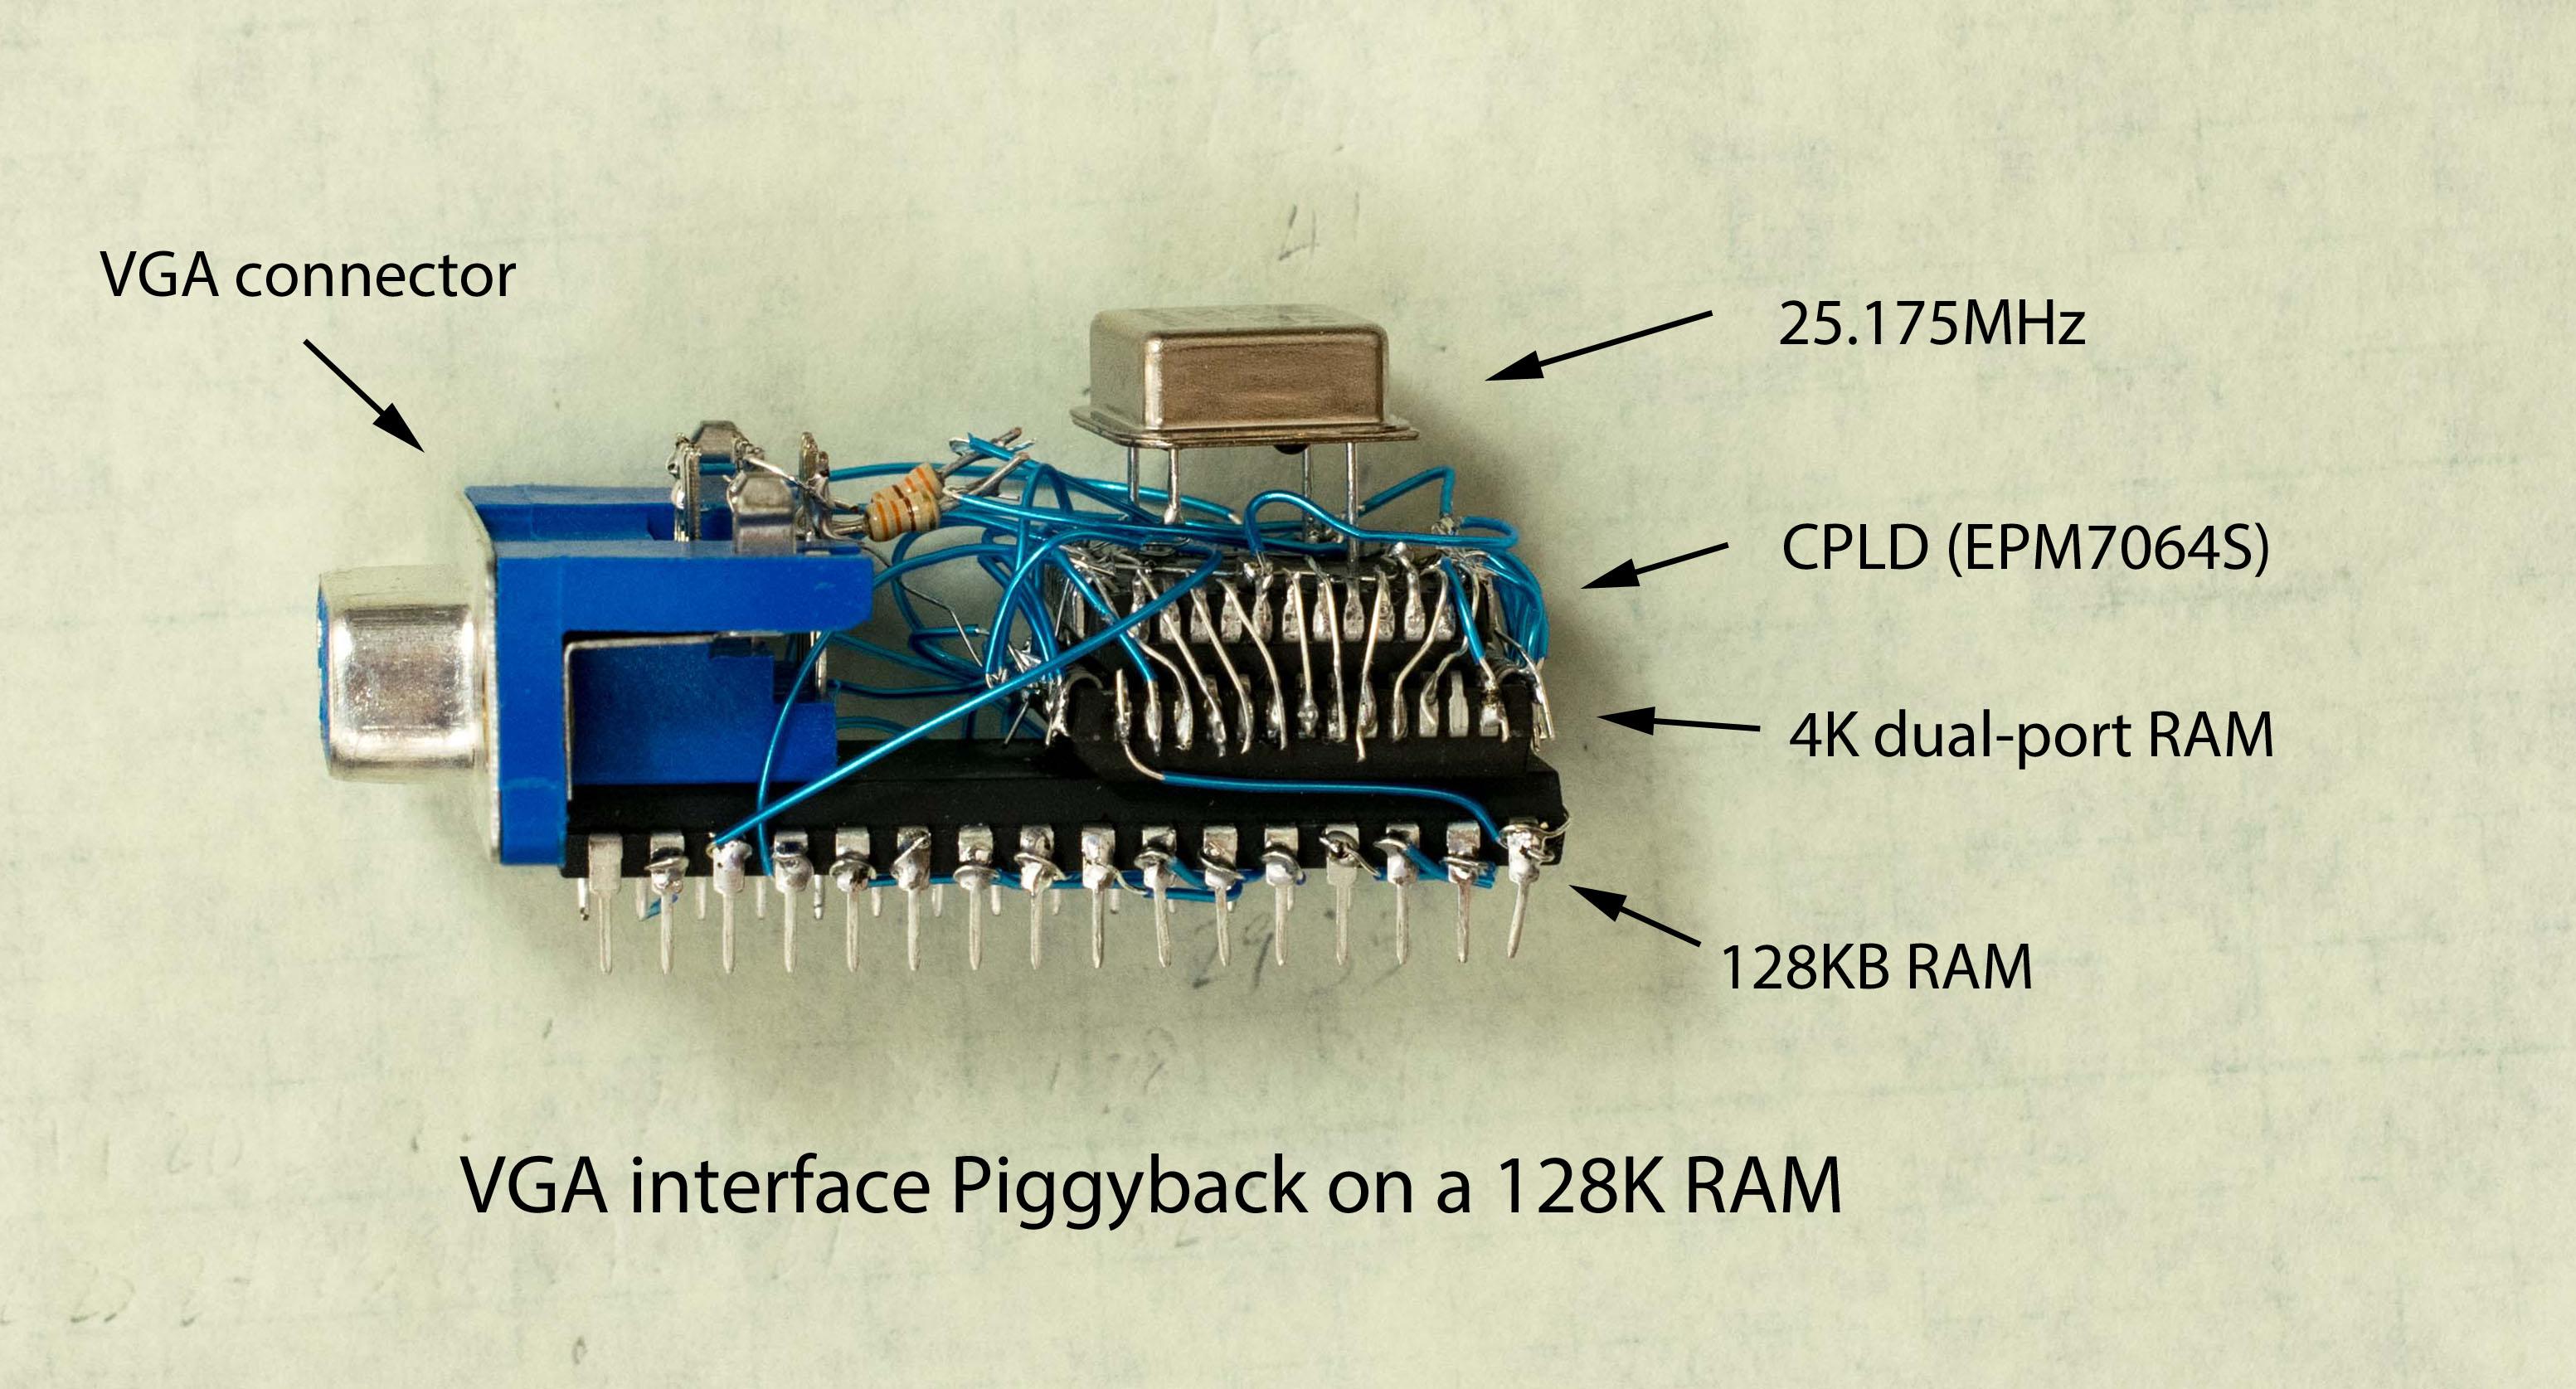 www.retrobrewcomputers.org_lib_plugins_ckgedit_fckeditor_userfiles_image_builderpages_plasmo_piggybackvga_vga_piggyback_on_ram.jpg